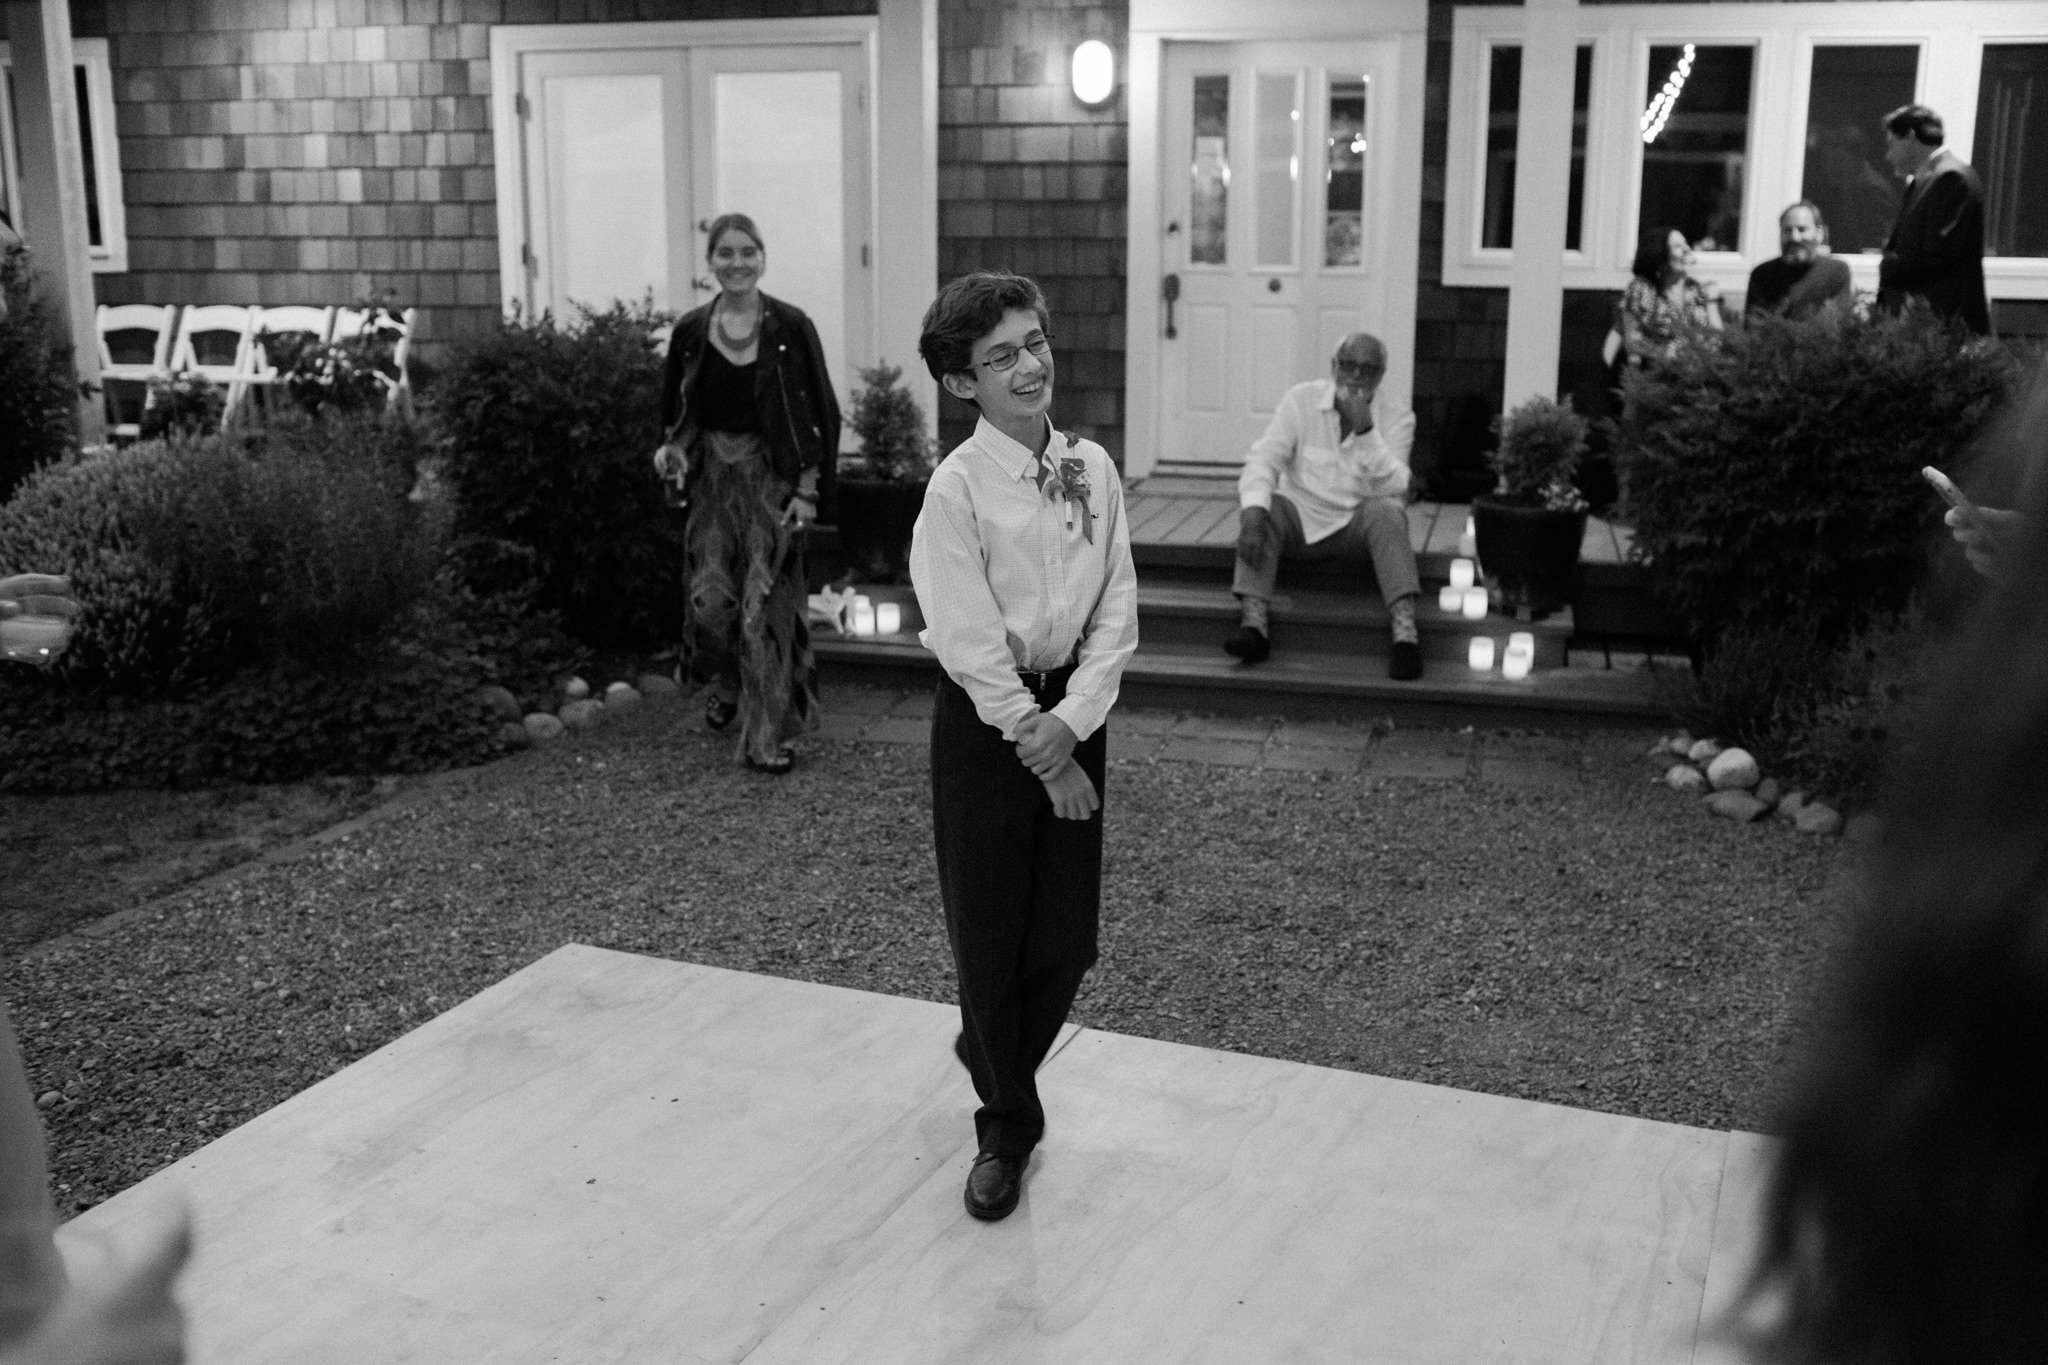 Backyard-Bainbridge-Island-Wedding-Alycia-Lovell-Photography-250.JPG